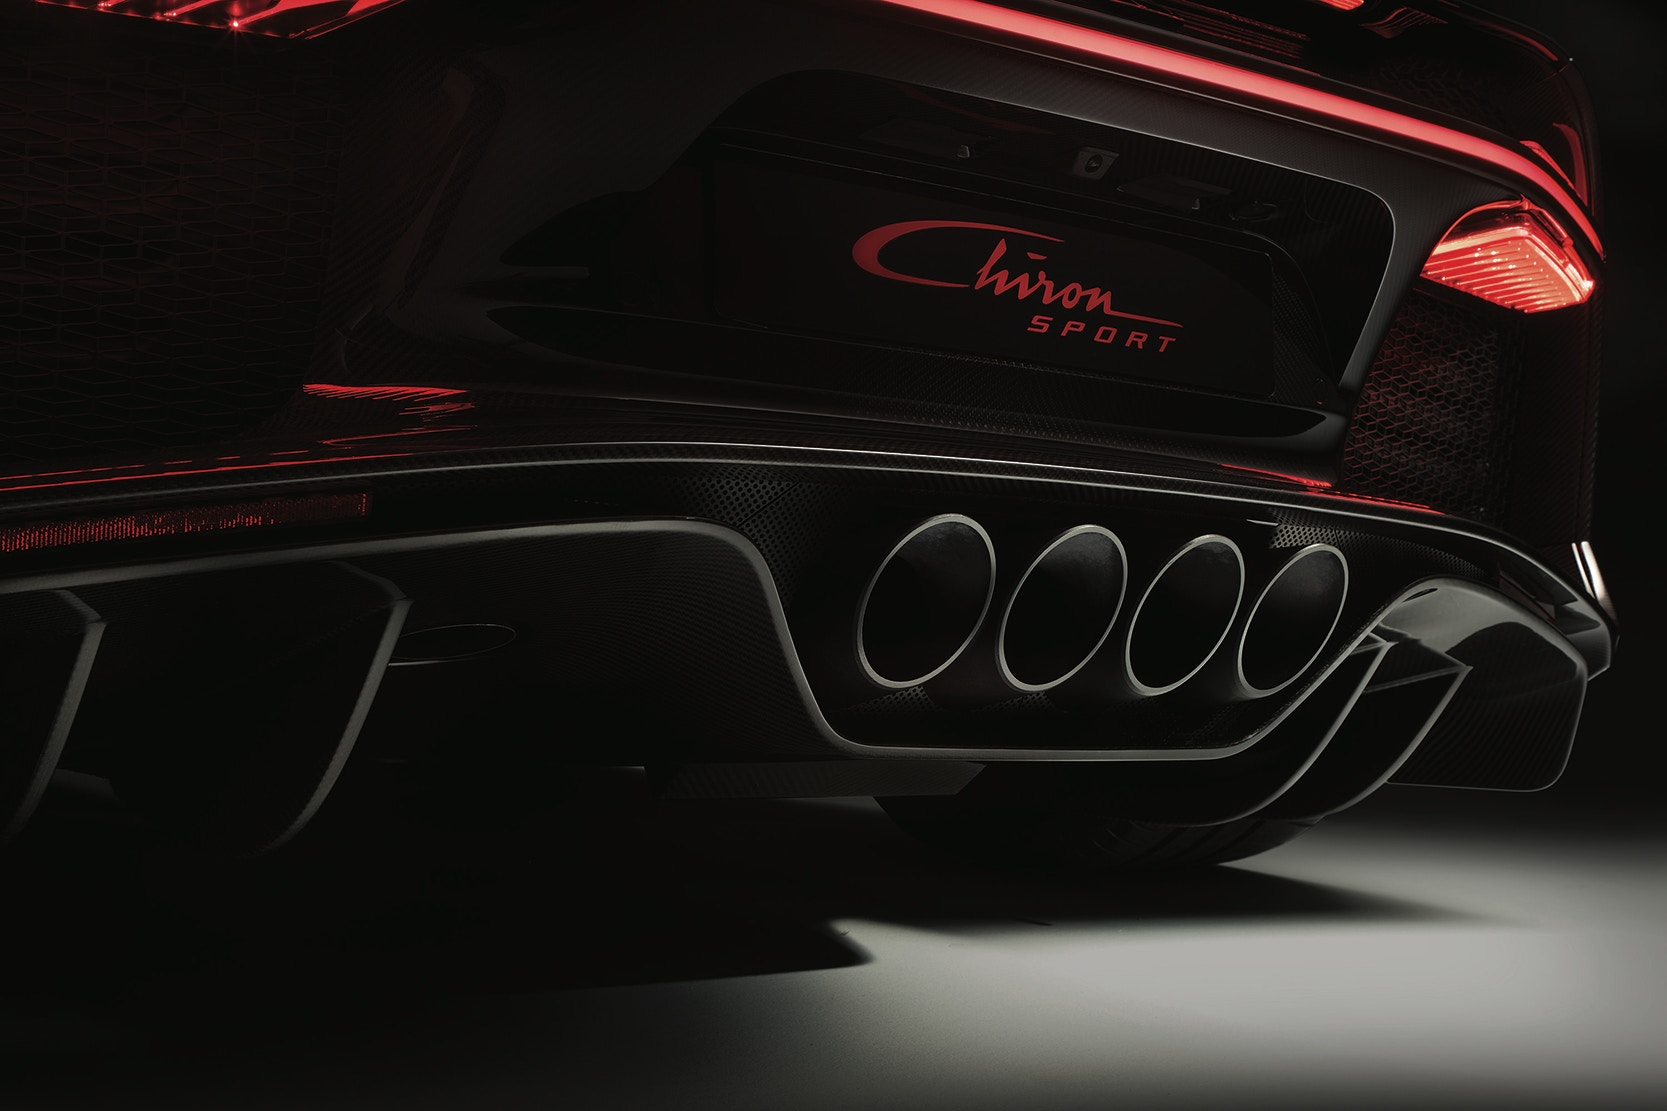 bugatti-chiron-sport-2019-3